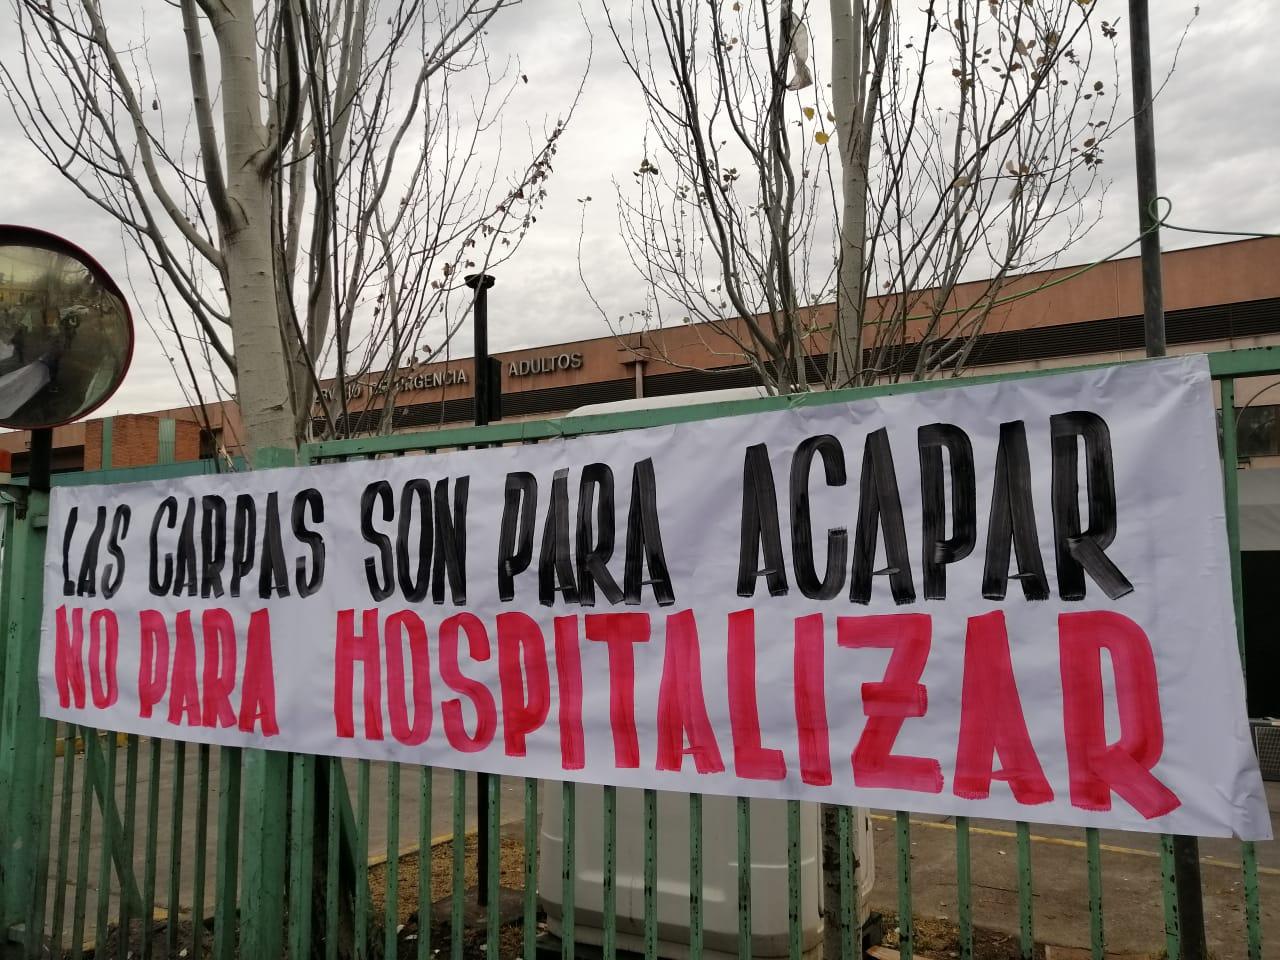 carpa hospital san jose